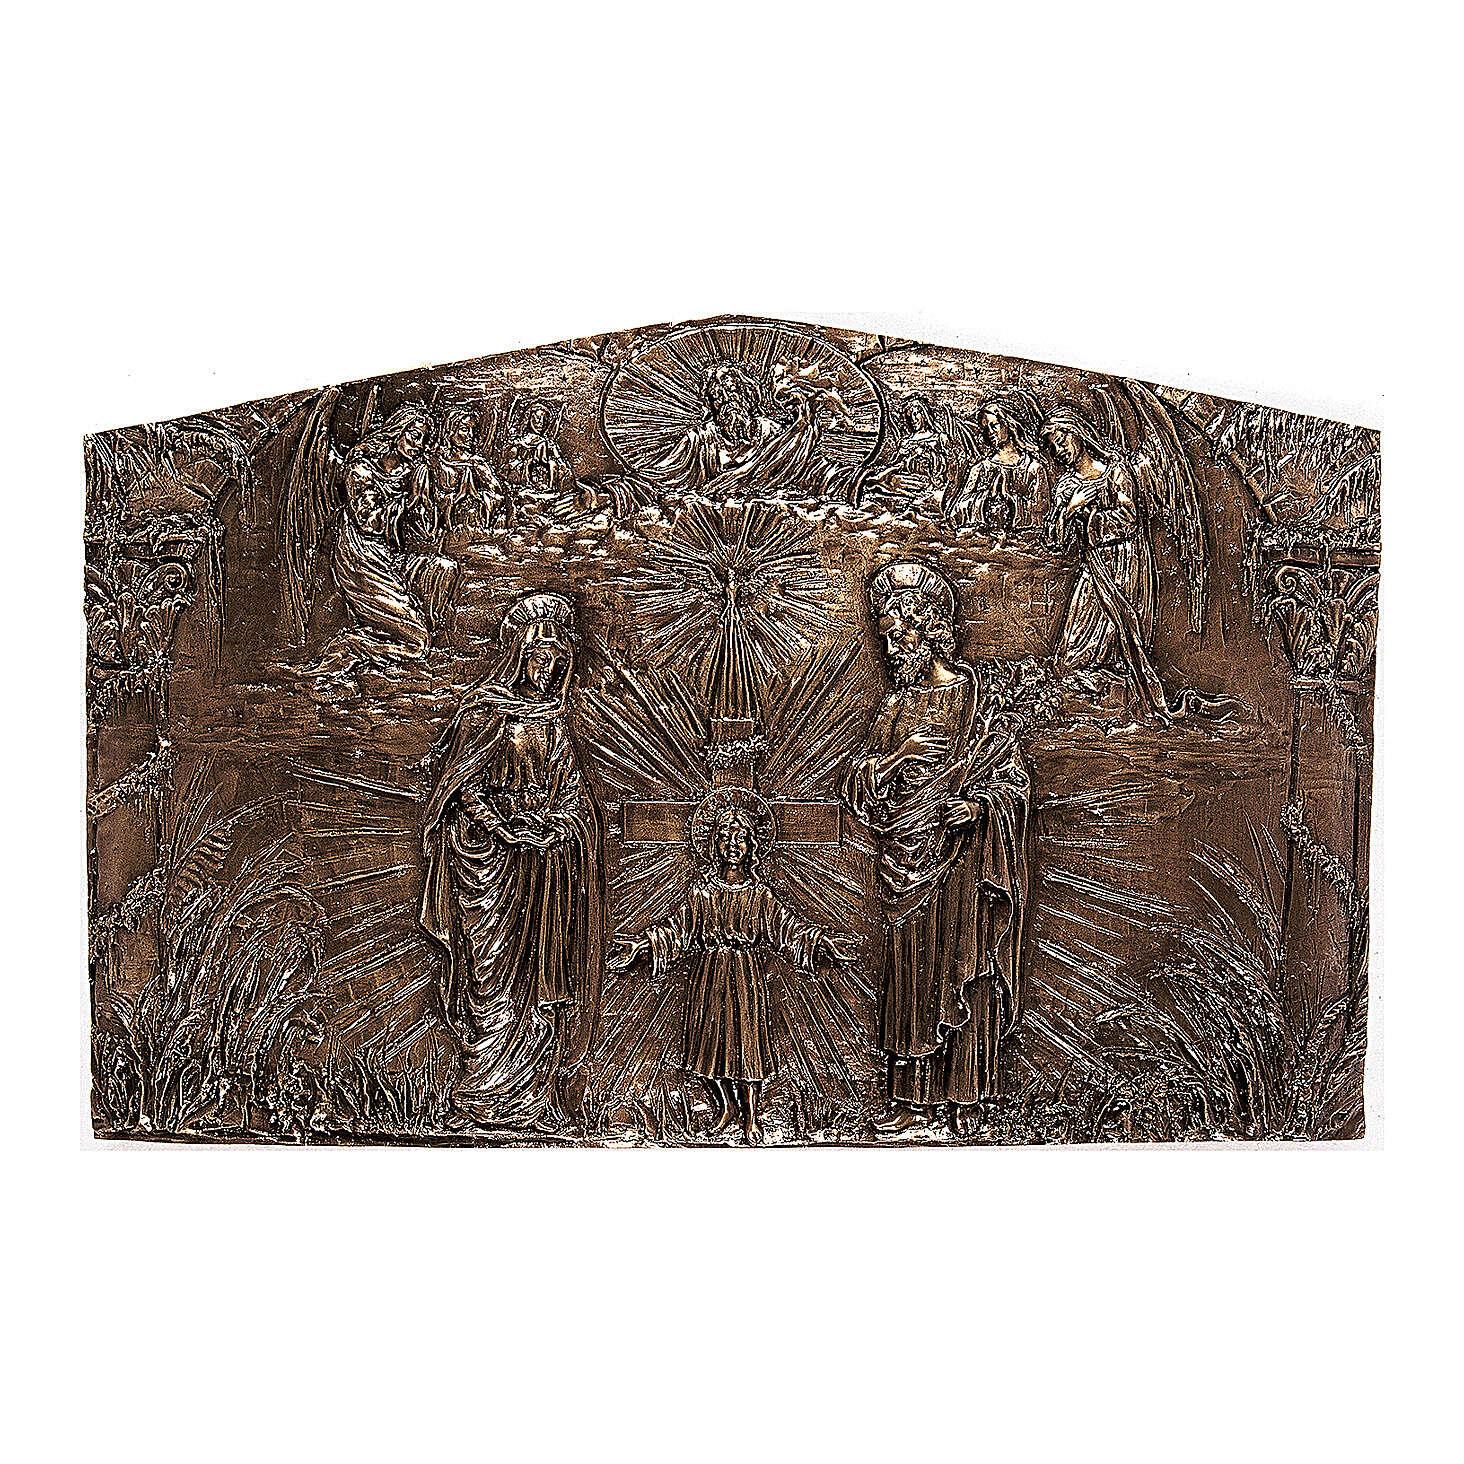 Targa bronzo Sacra Famiglia 80 cm per ESTERNO 3